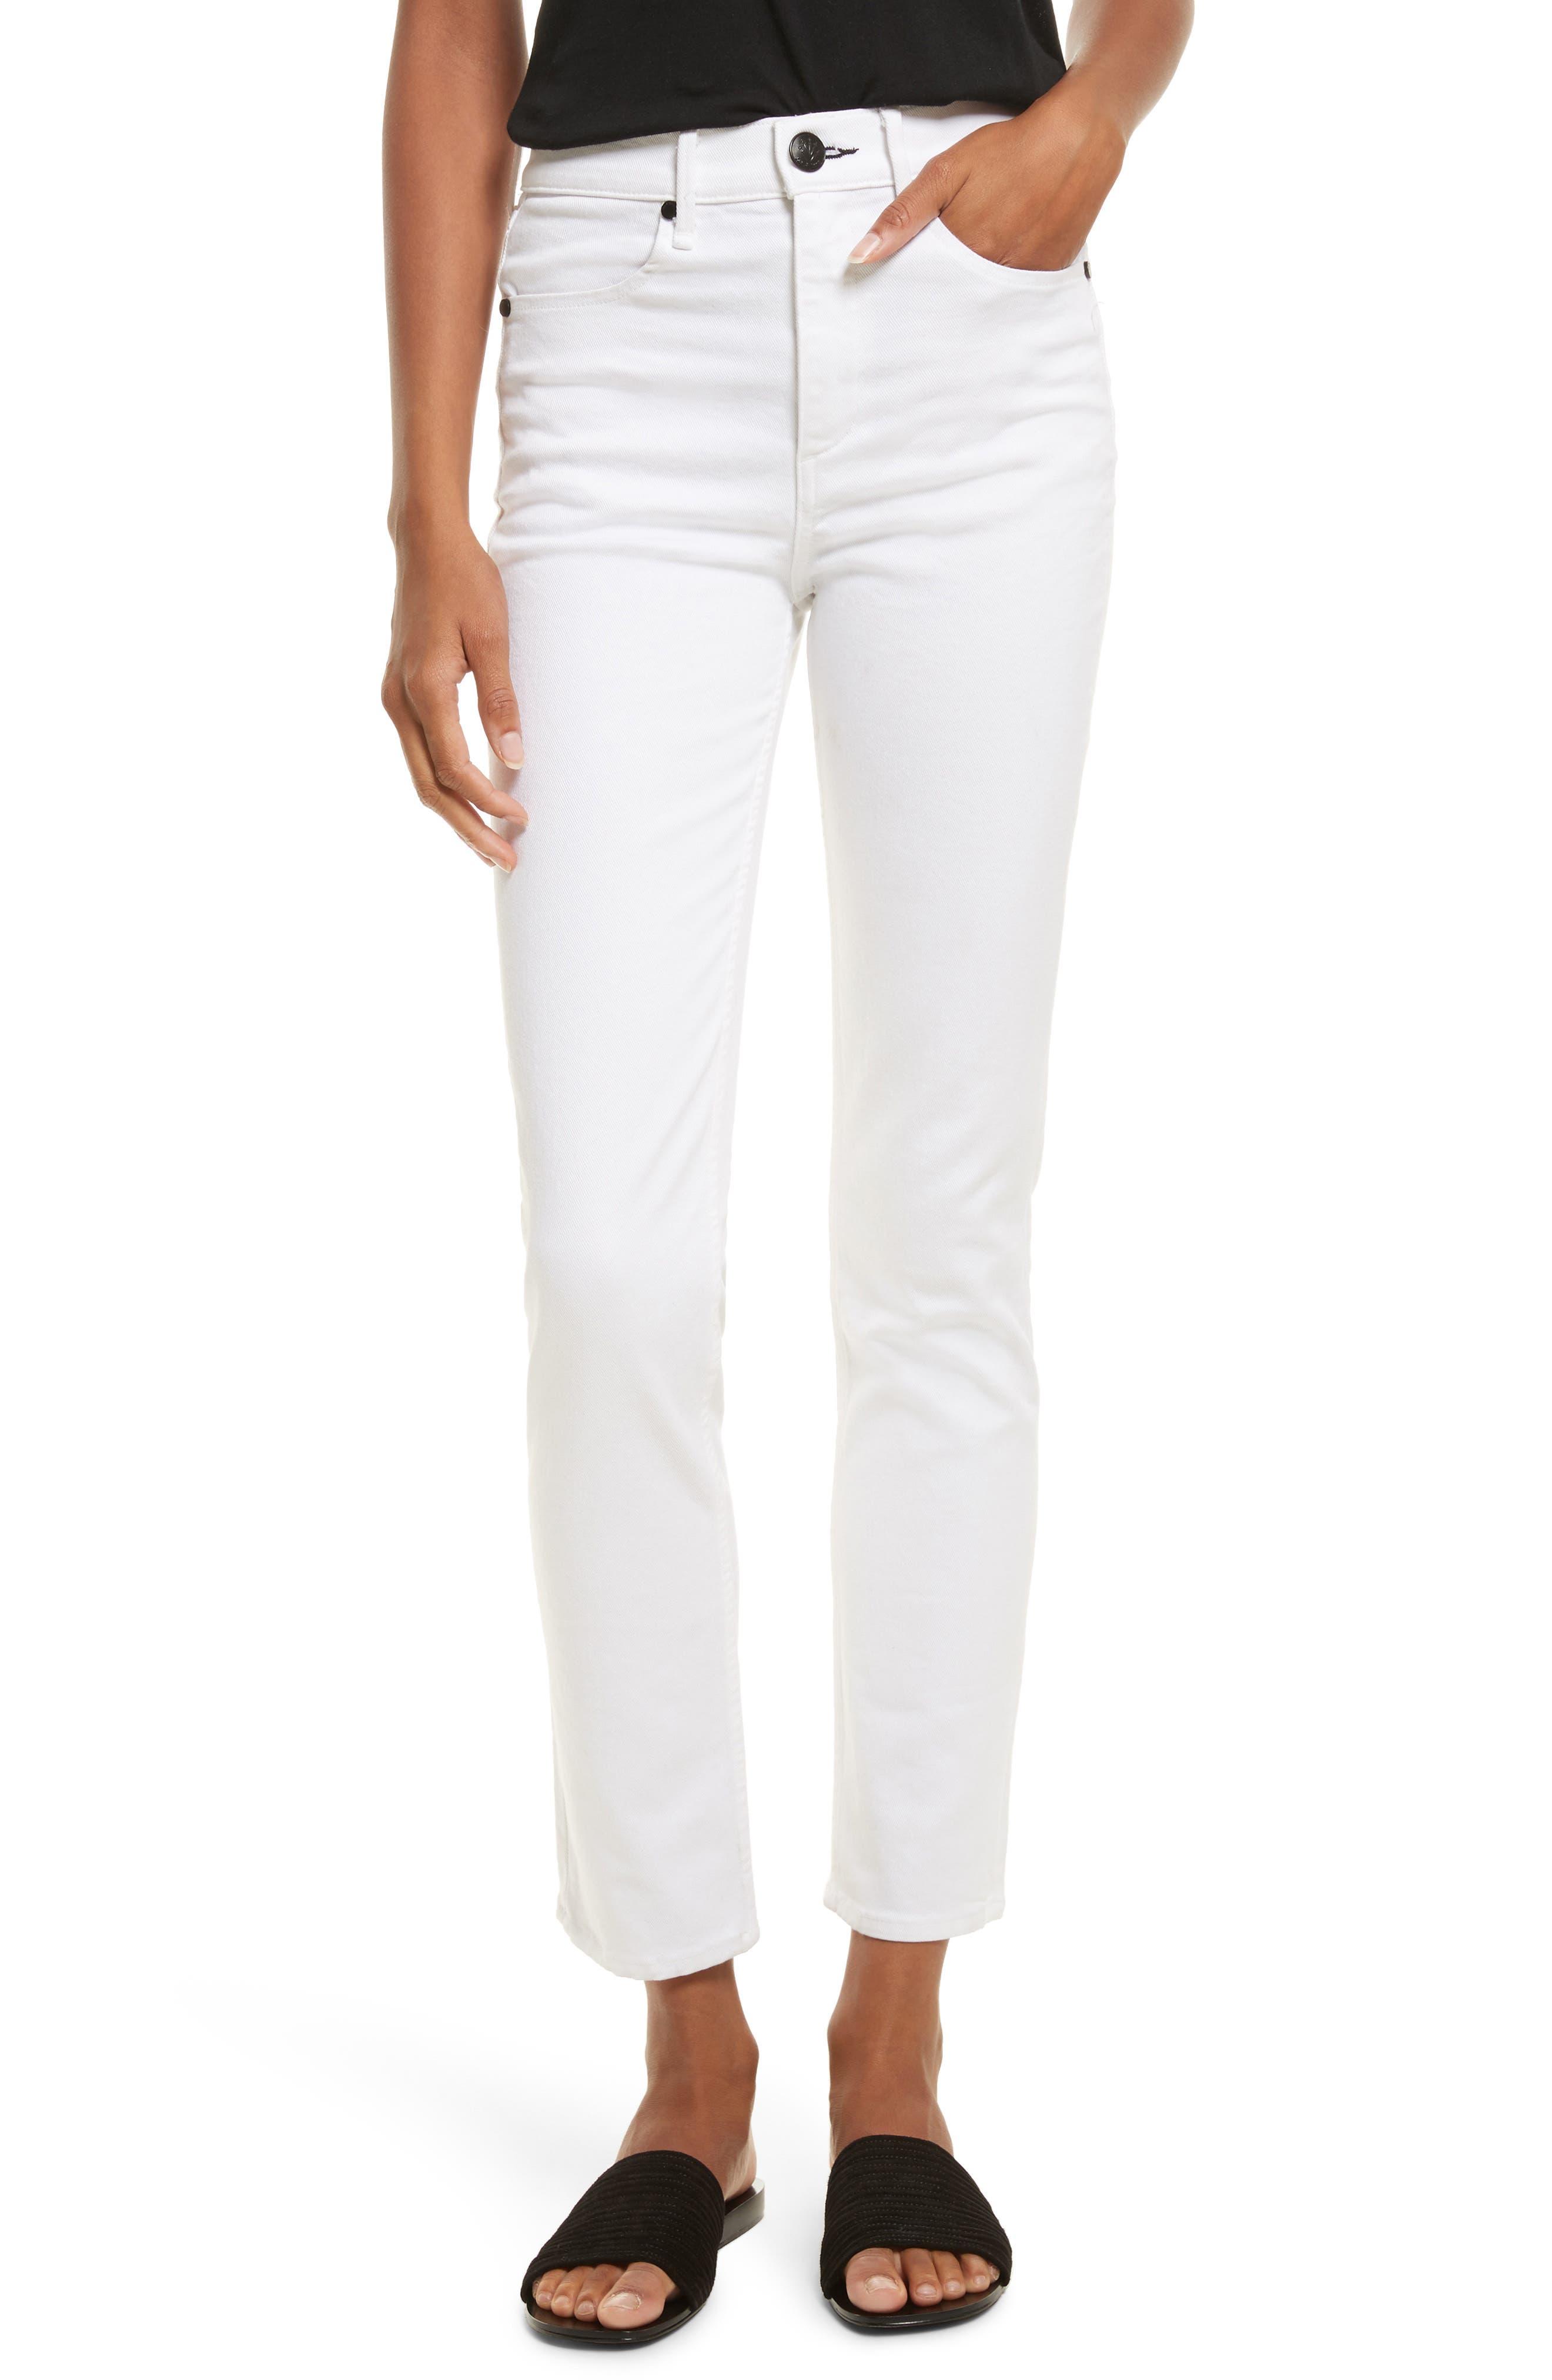 Main Image - rag & bone/JEAN High Waist Ankle Skinny Jeans